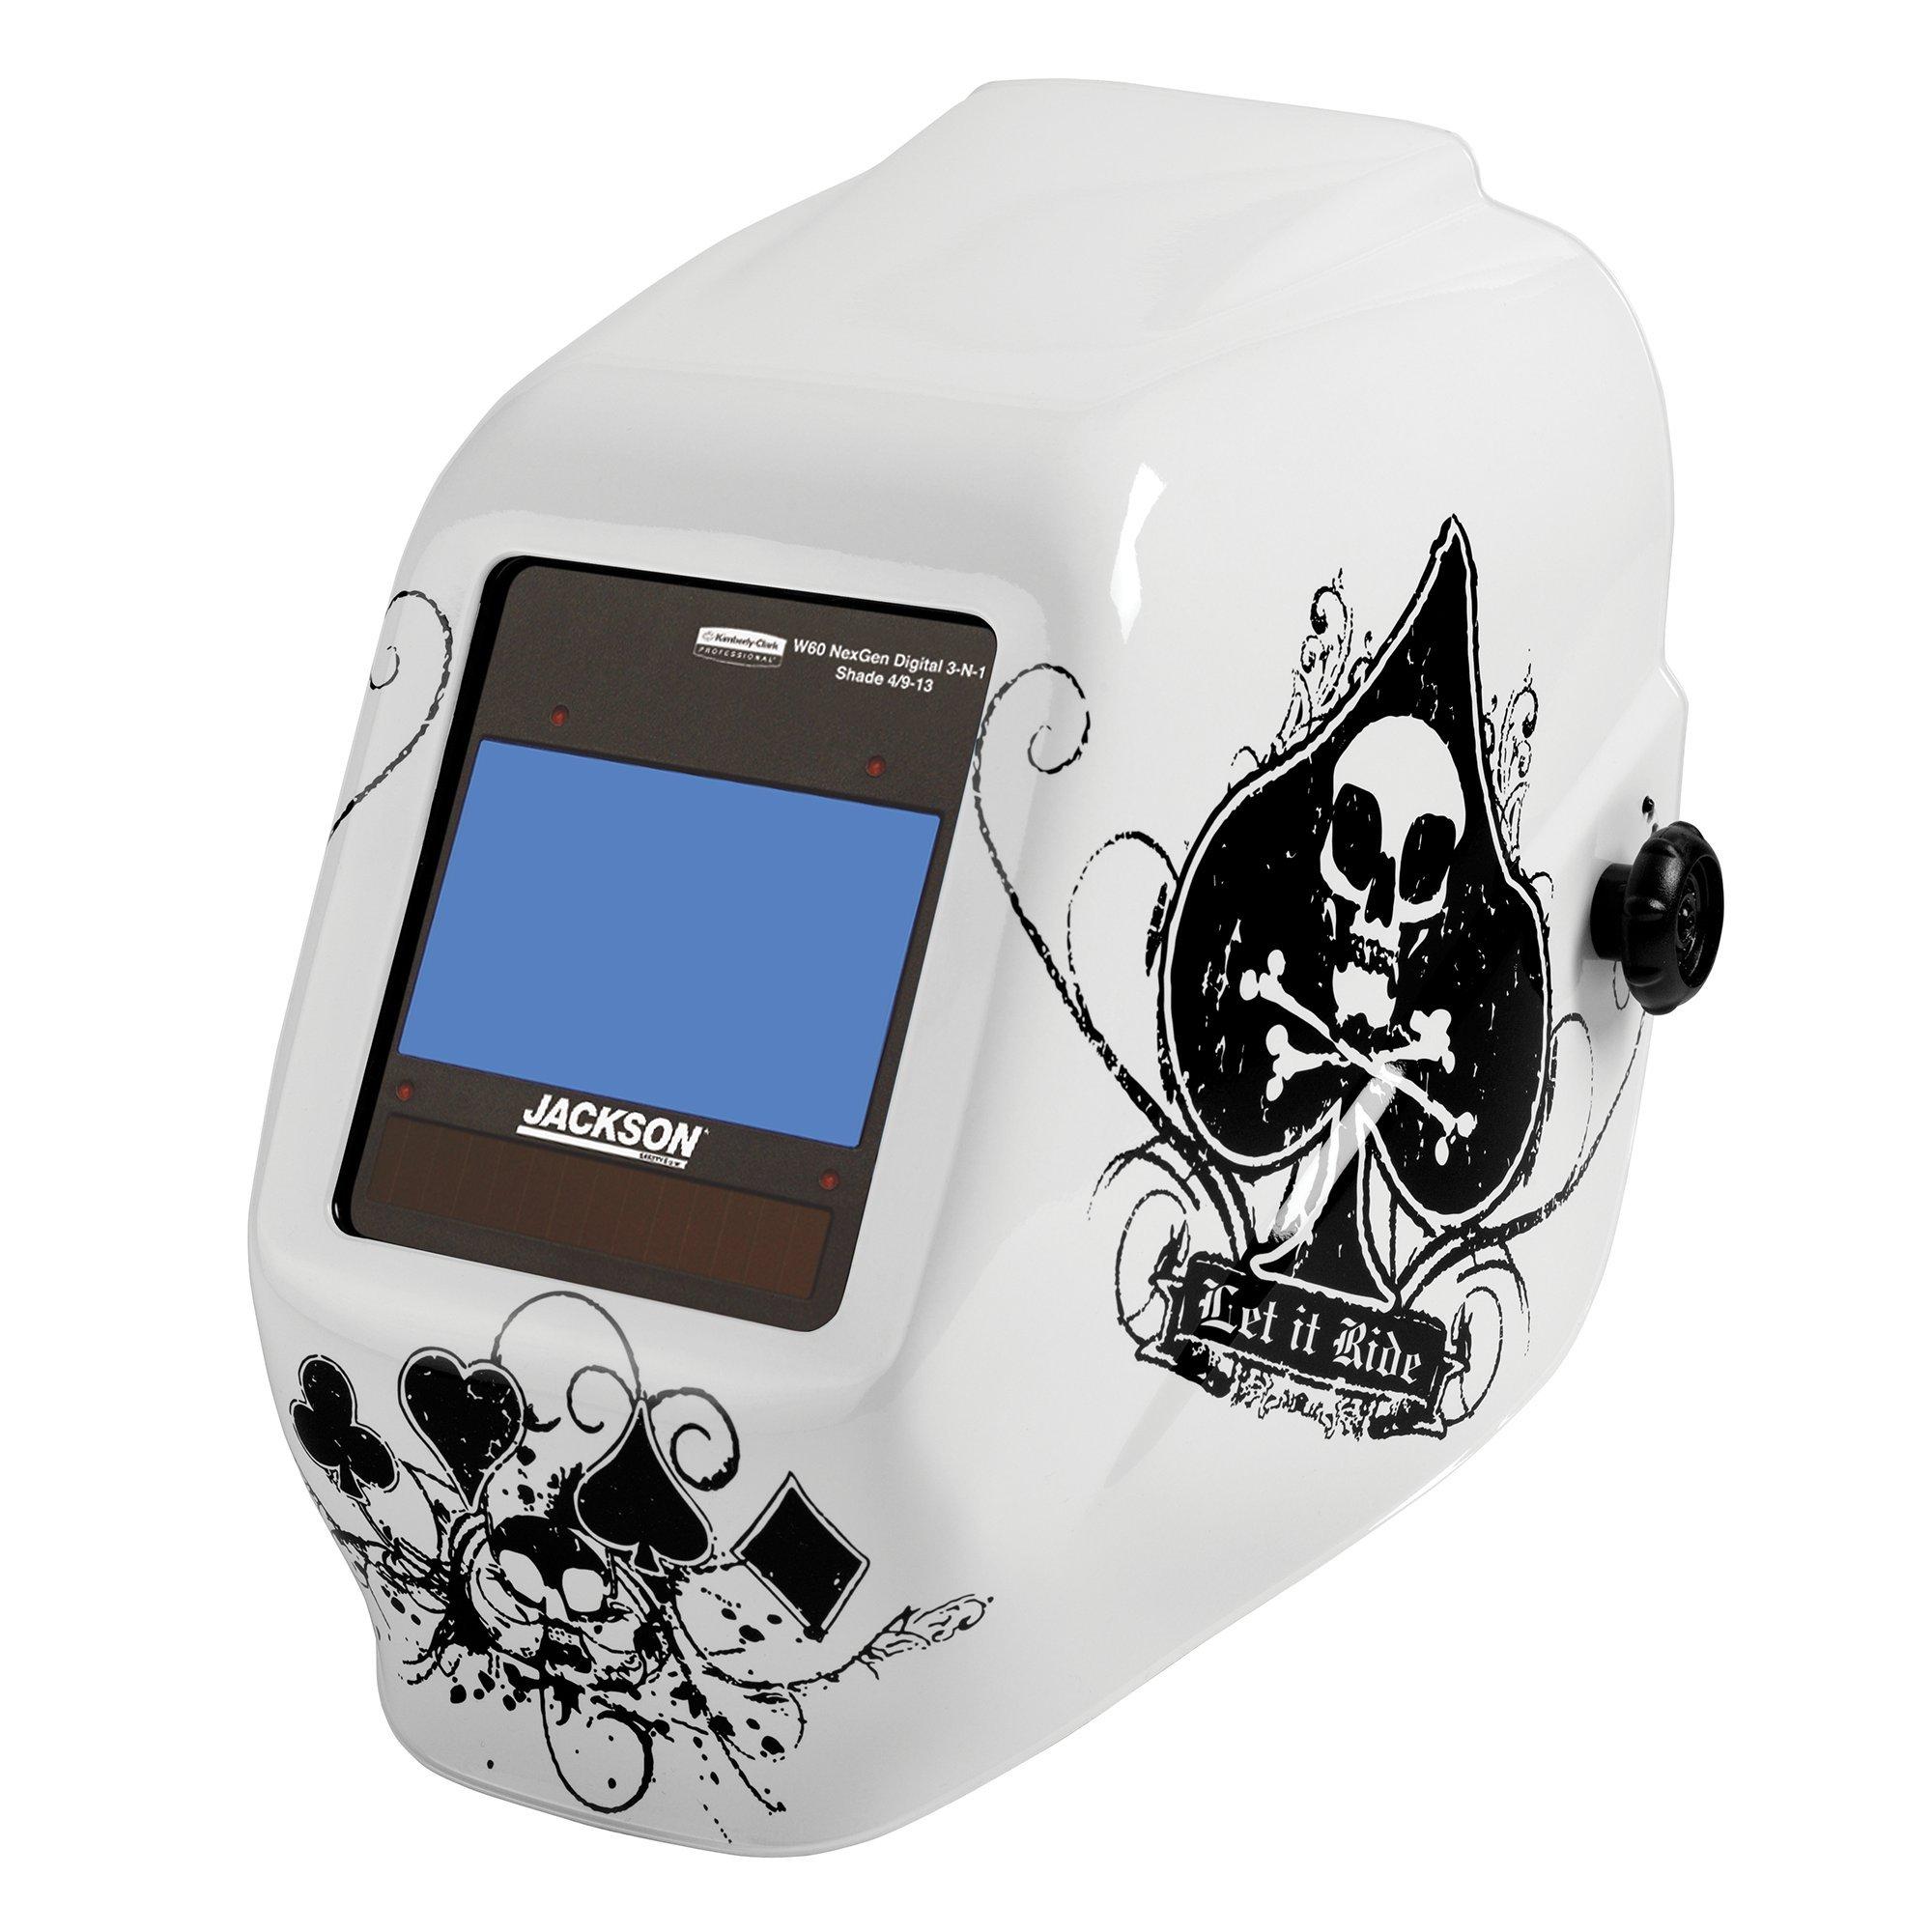 Jackson Safety TrueSight II Digital Auto Darkening Welding Helmet with Balder Technology (46164), HLX, ADF, Ace of Spades